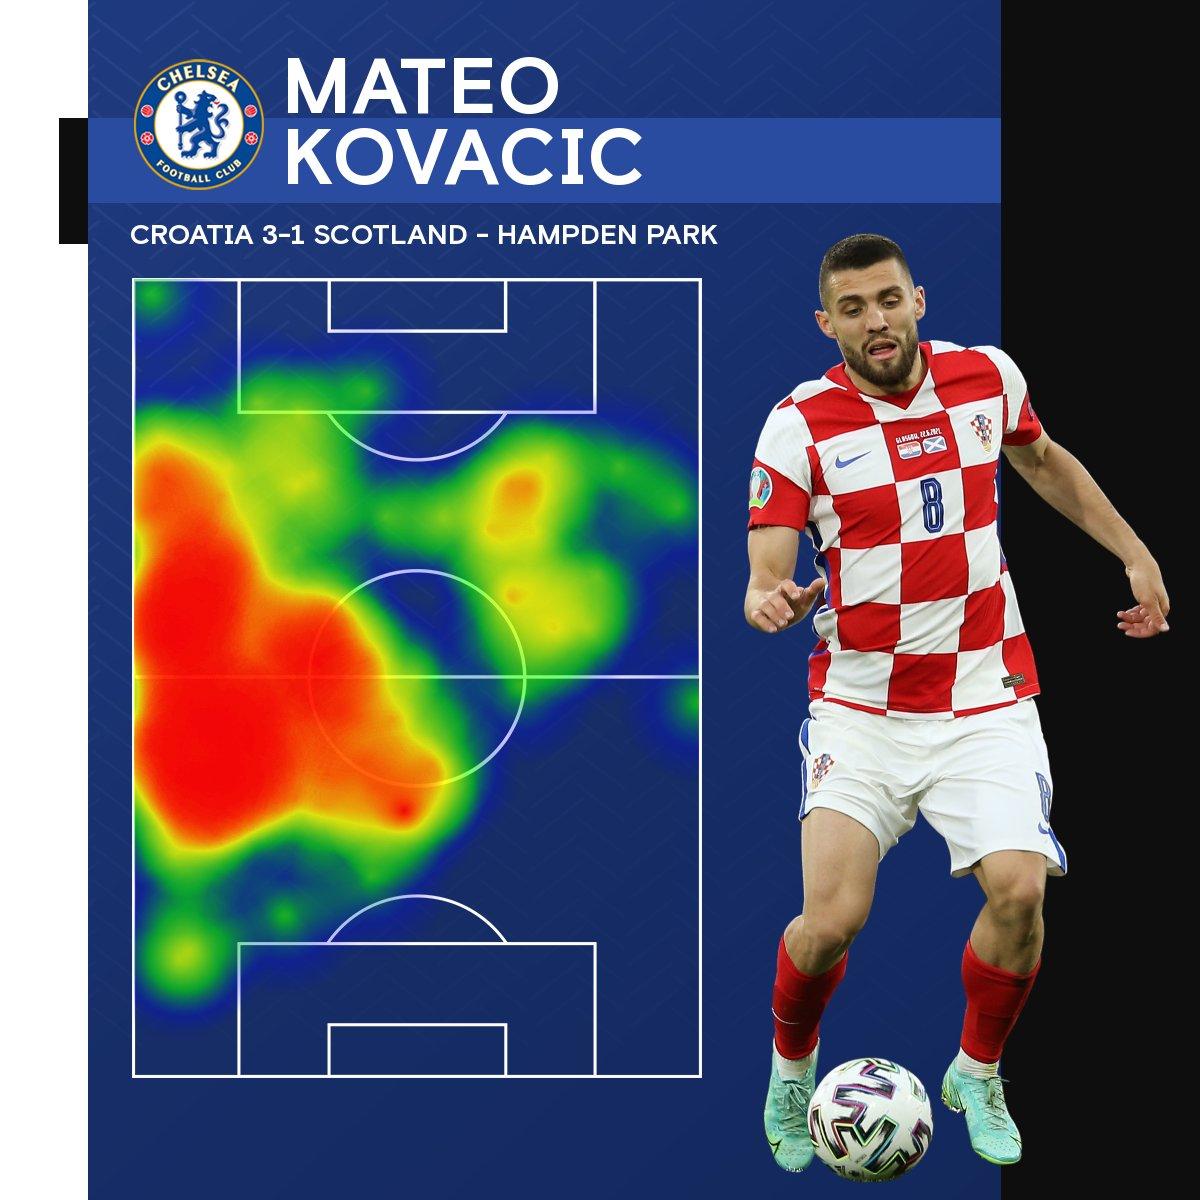 Bossed it, Kova! 👏  #Euro2020 https://t.co/NgjhpJt4LY